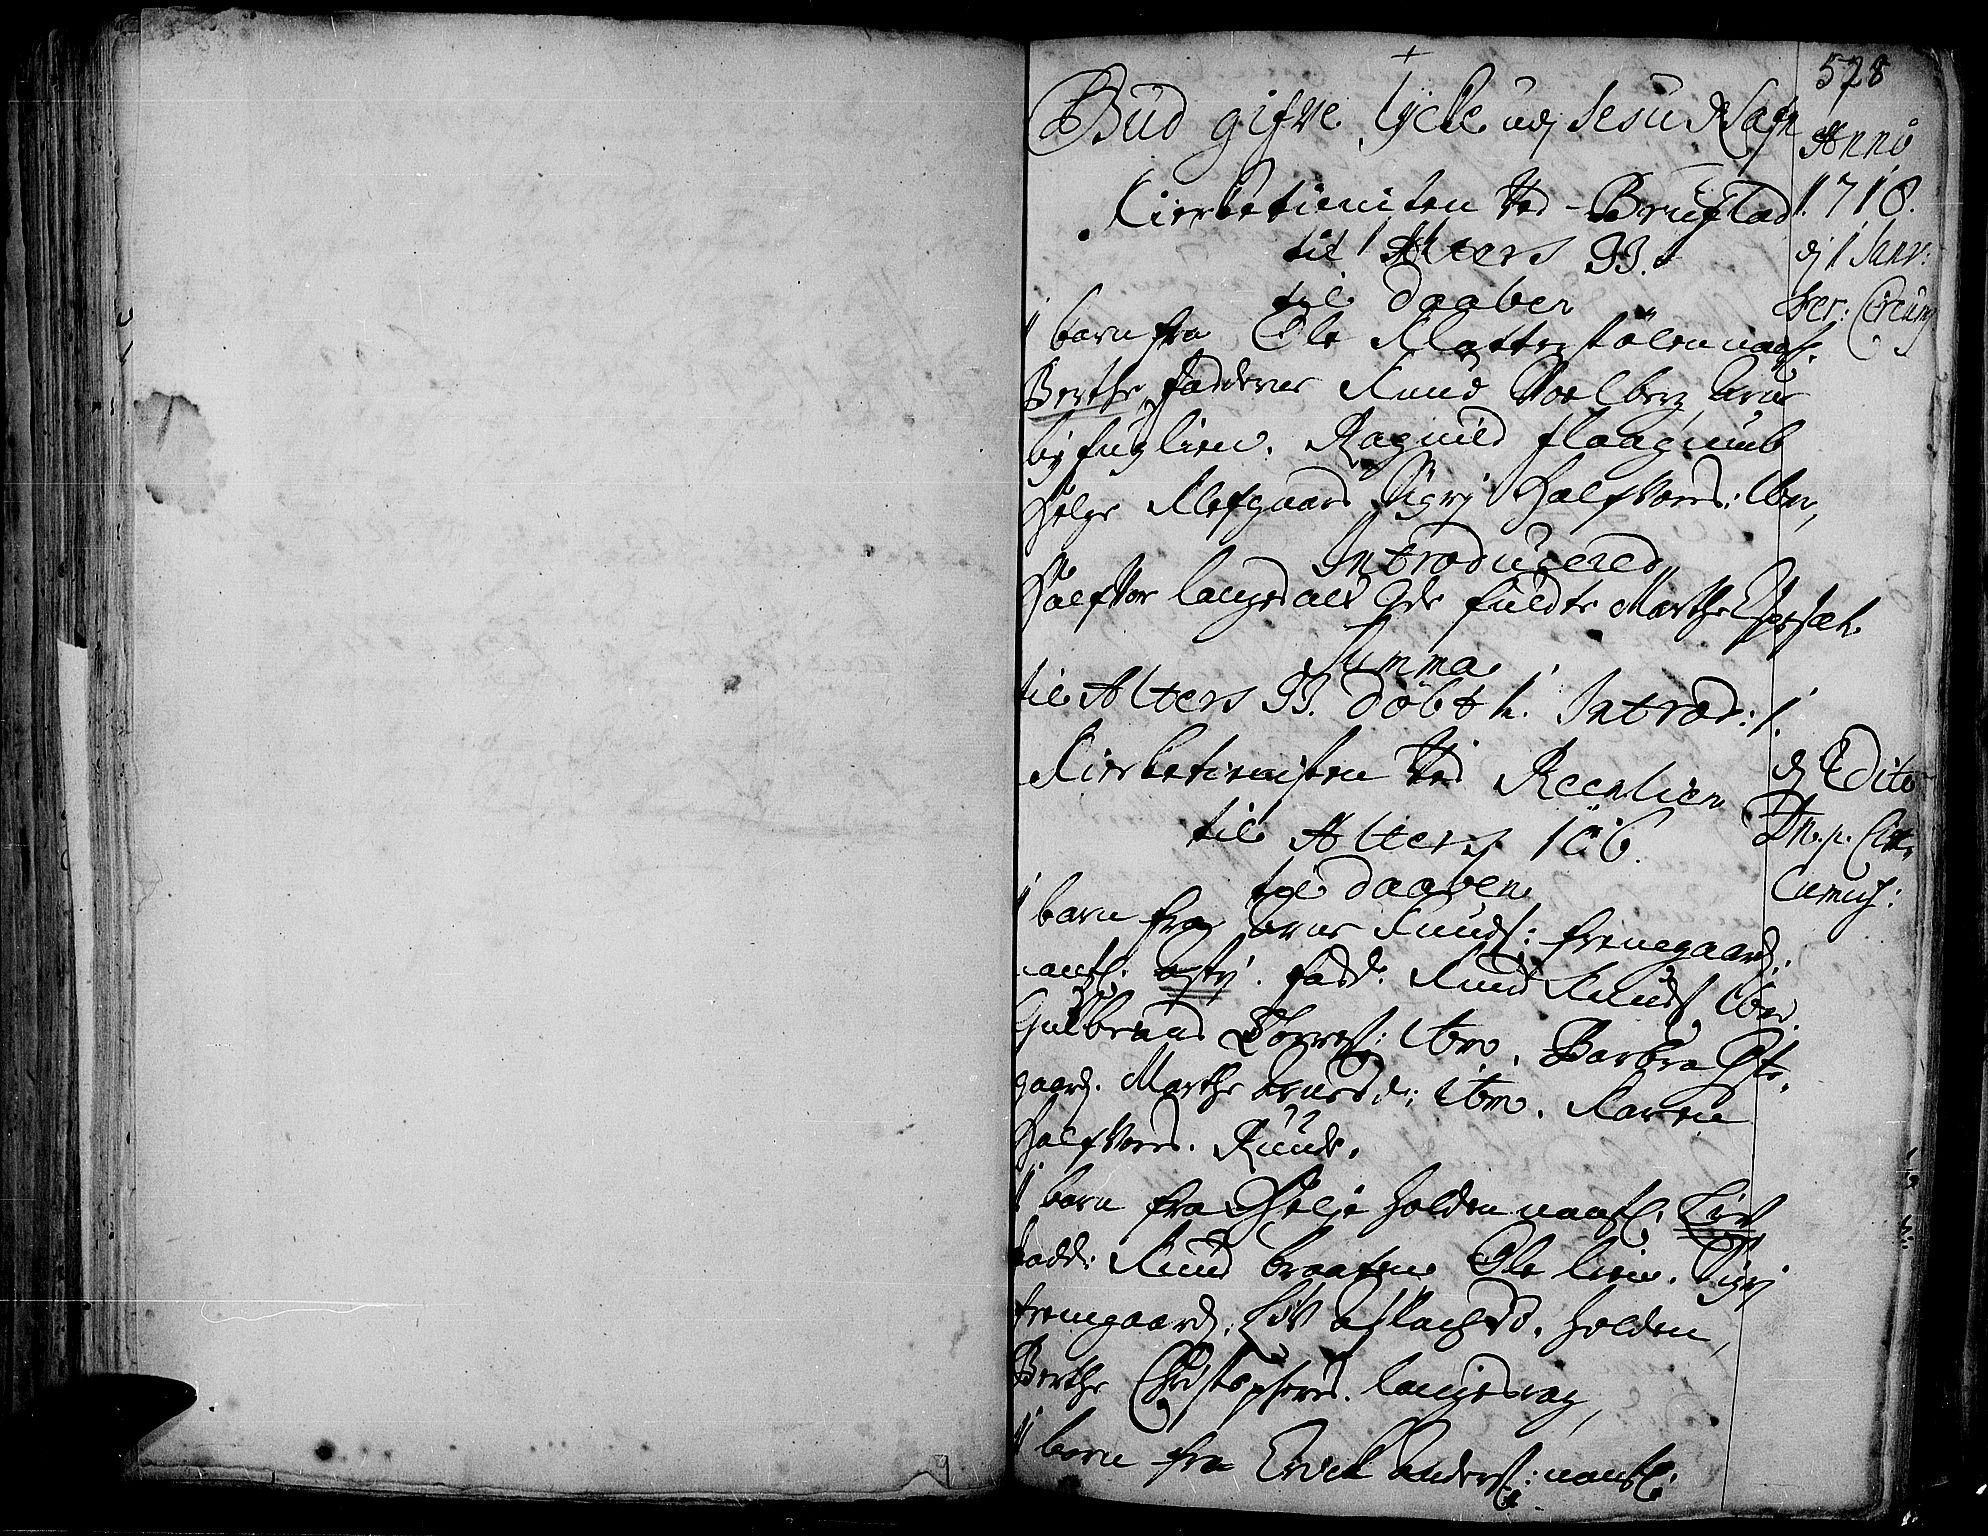 SAH, Aurdal prestekontor, Ministerialbok nr. 1-3, 1692-1730, s. 528